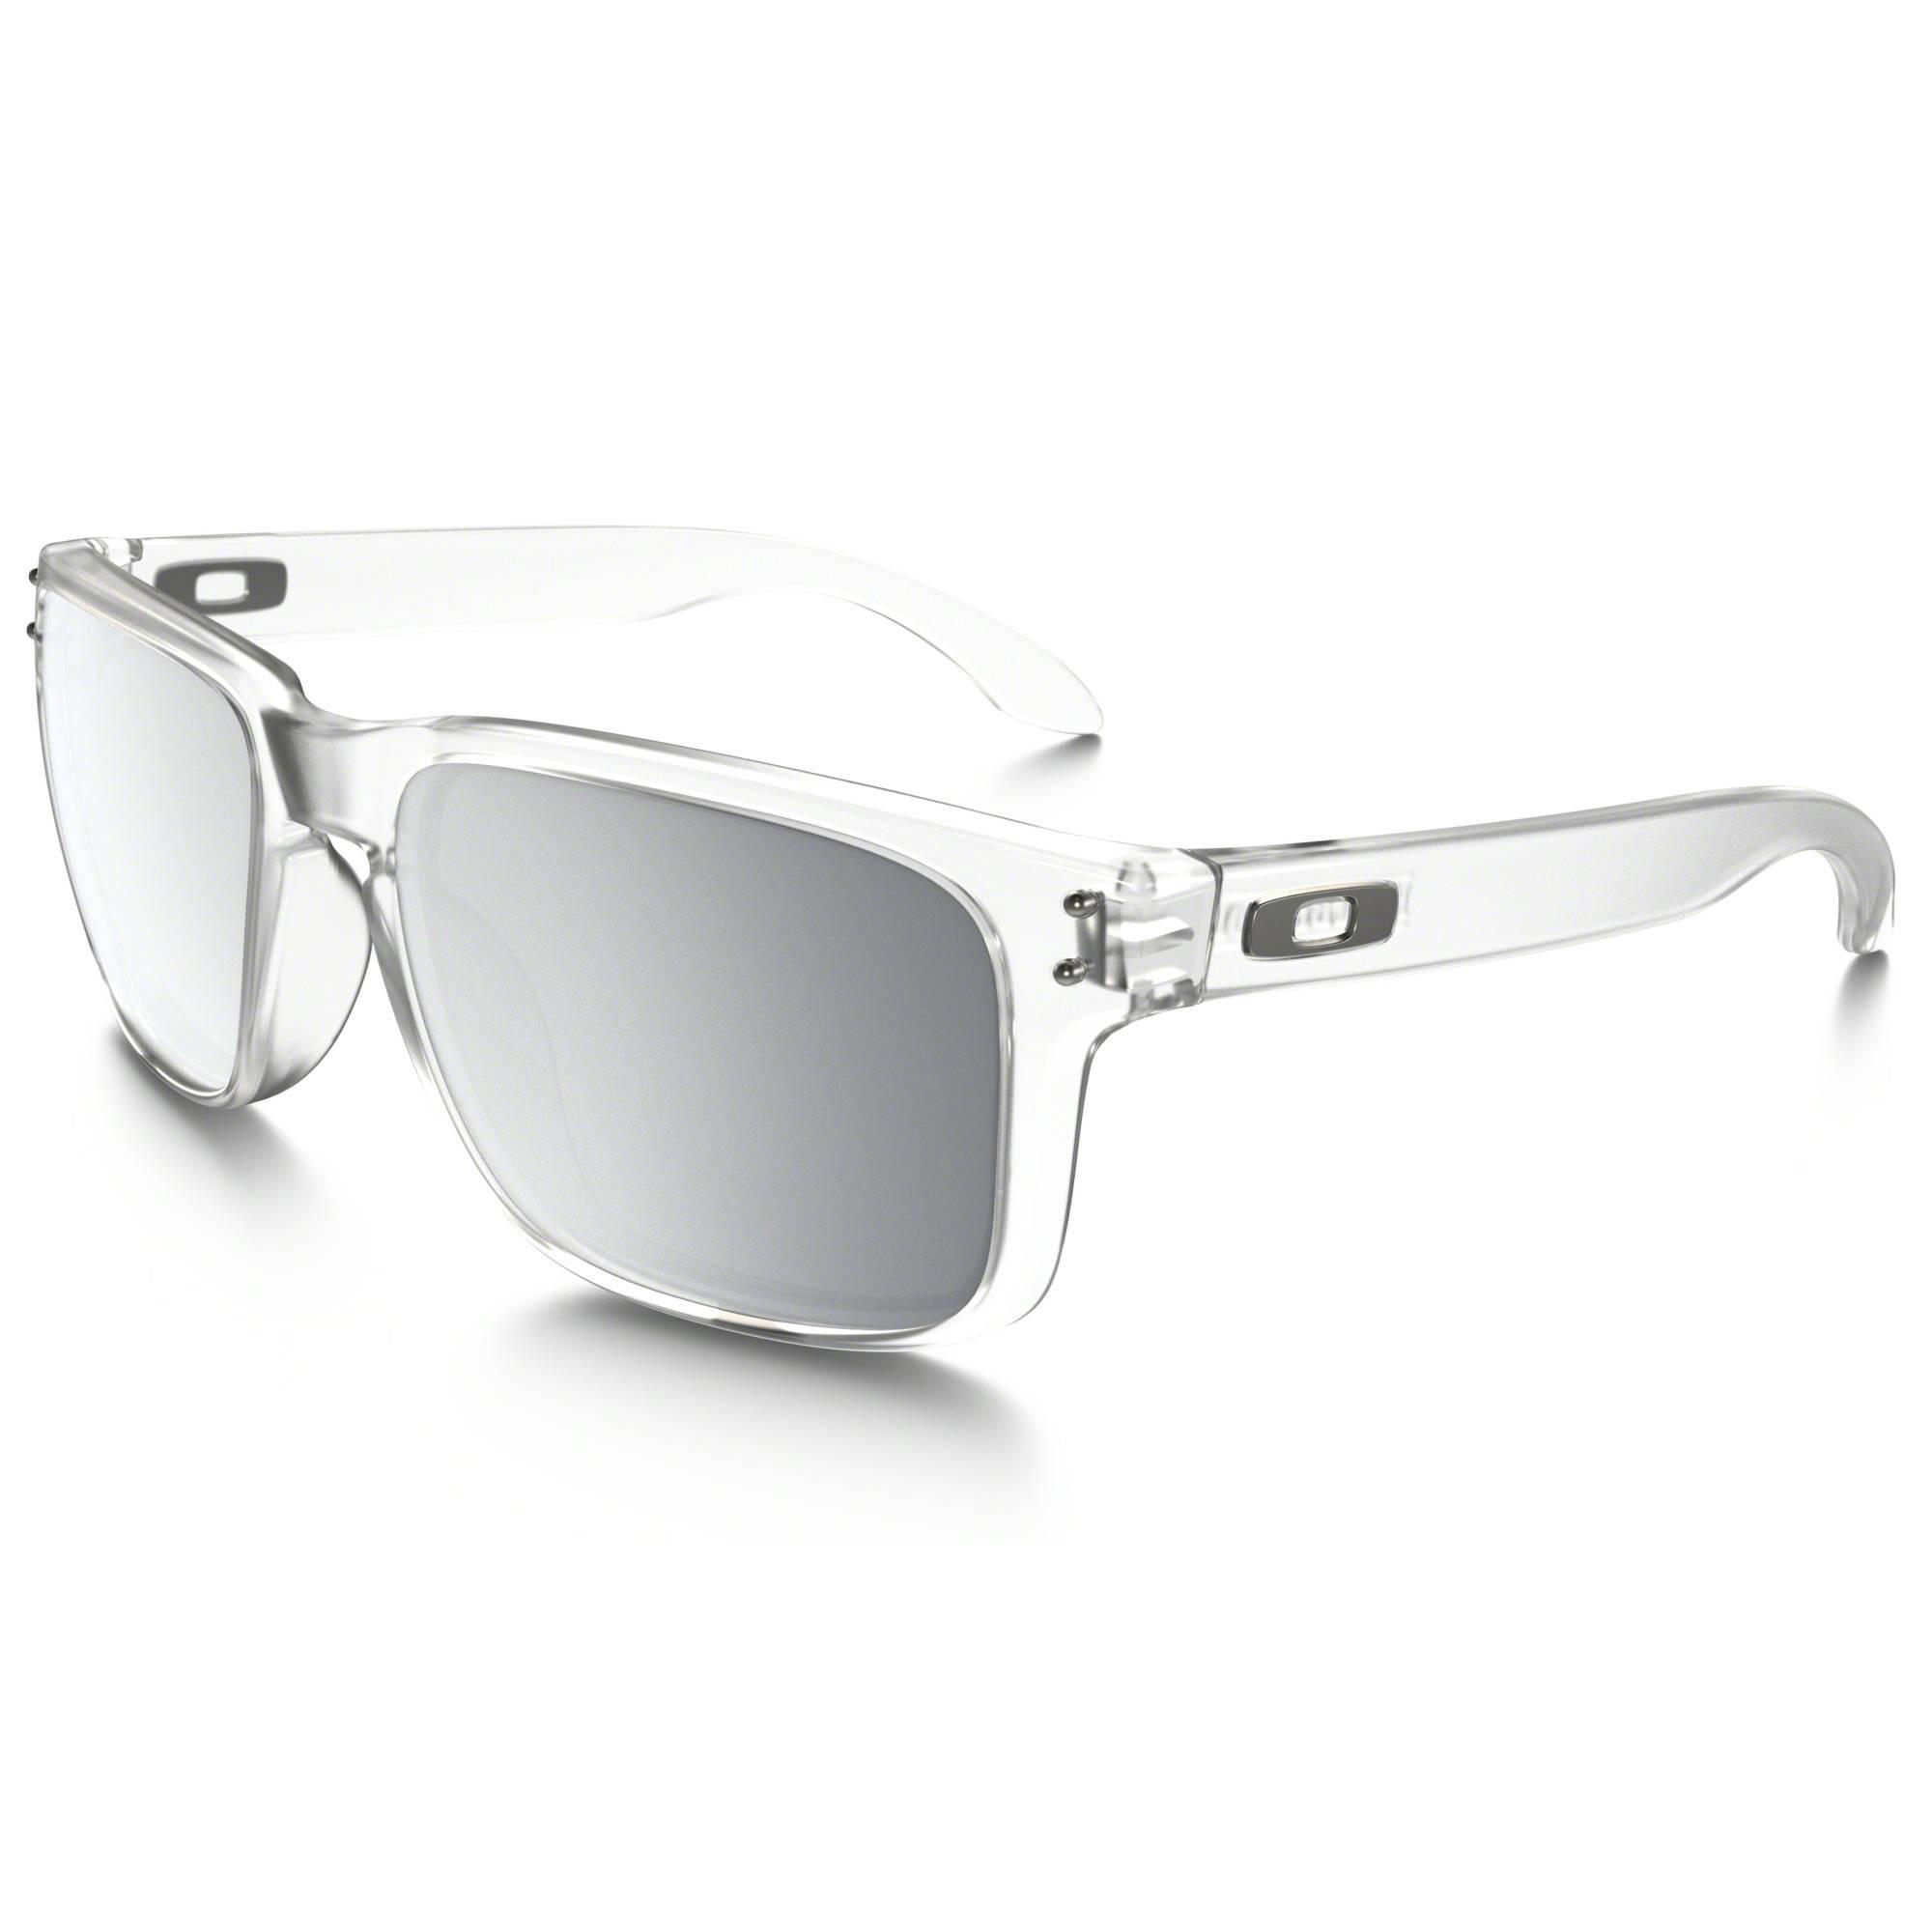 Oakley Holbrook Sunglasses 0OO9102-91020655 B&H Photo Video